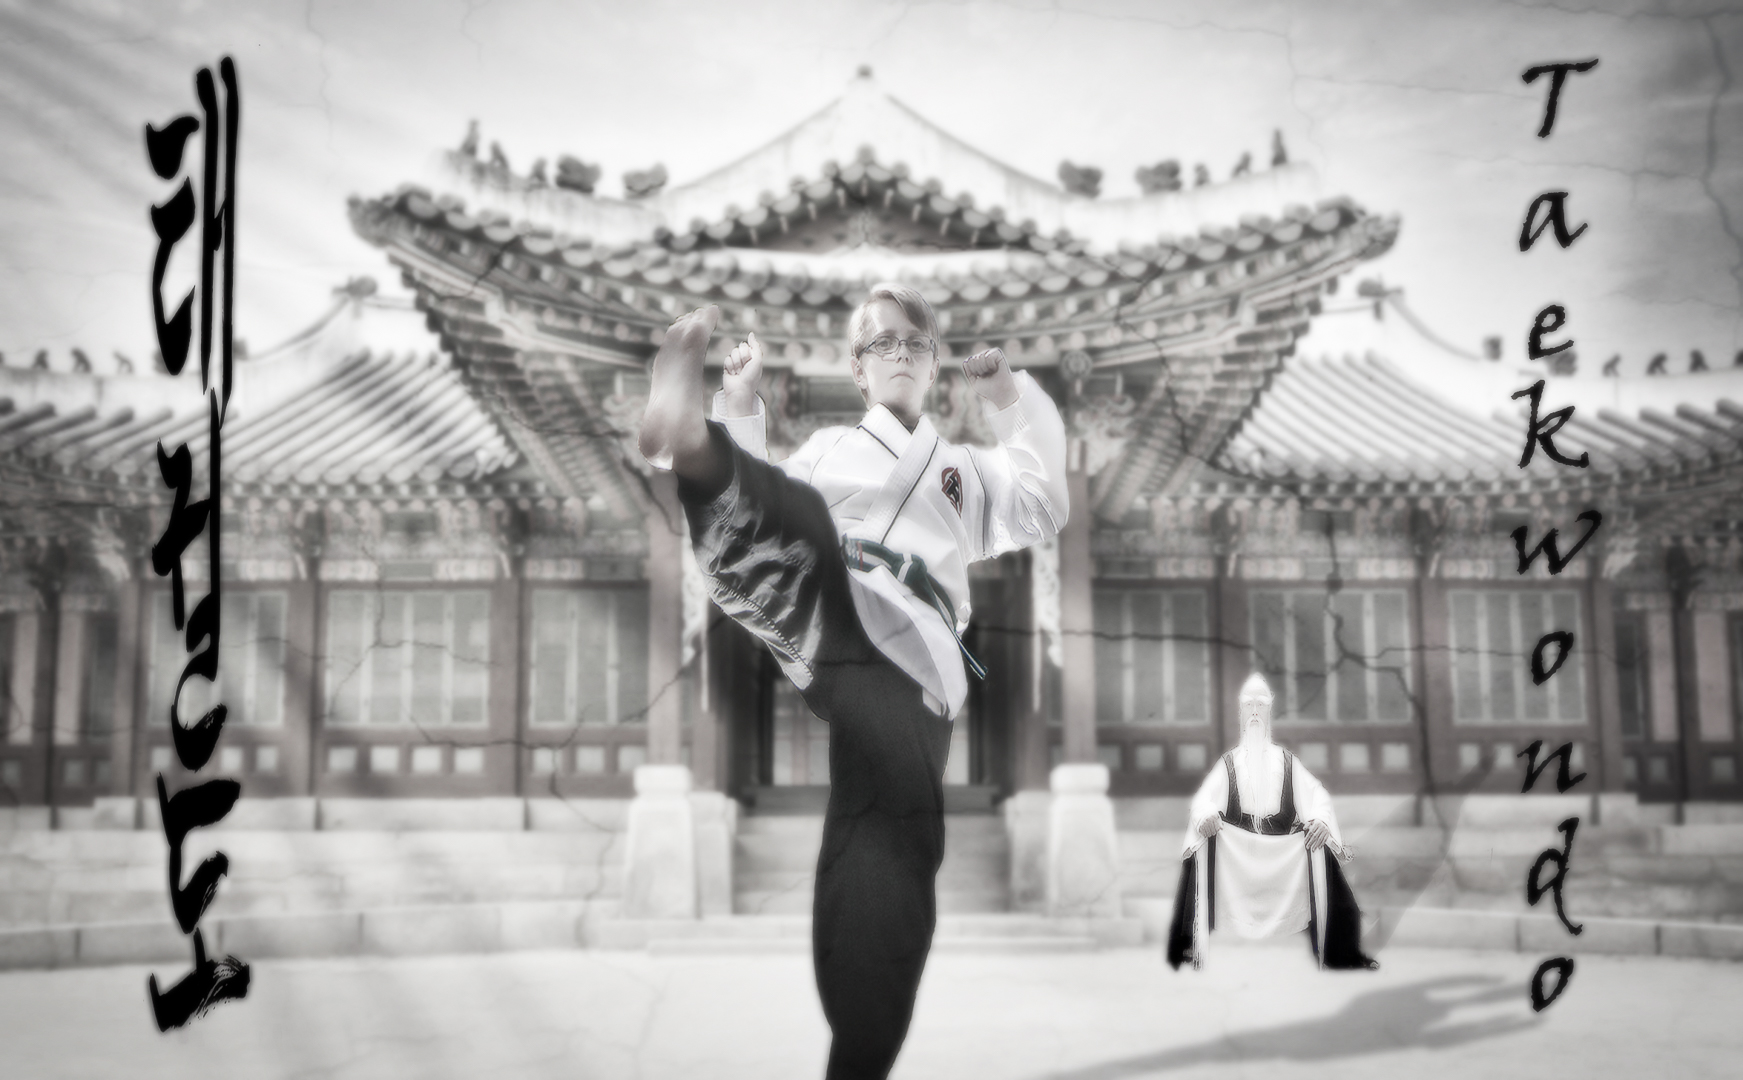 Zach.Taekwondo.CompositeLR.JPG